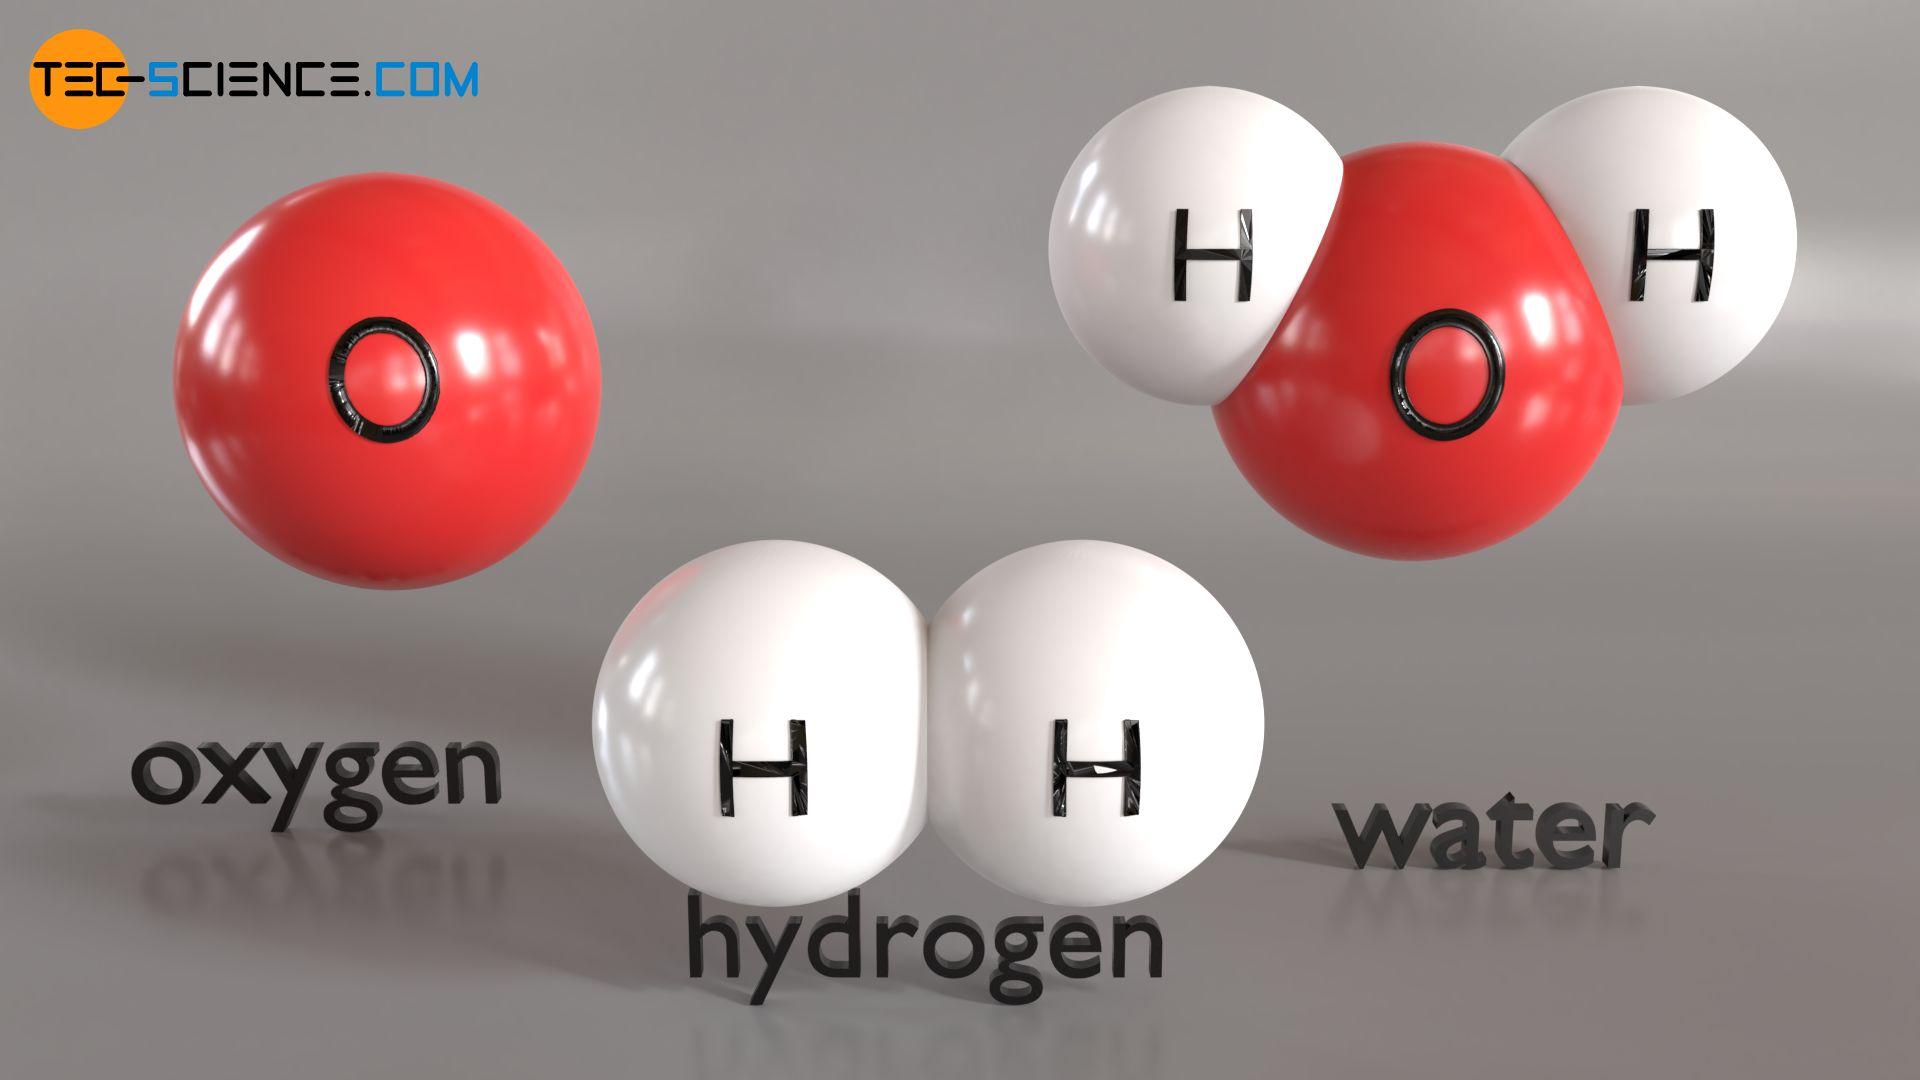 Particle model of matter (oxygen, hydrogen, water)